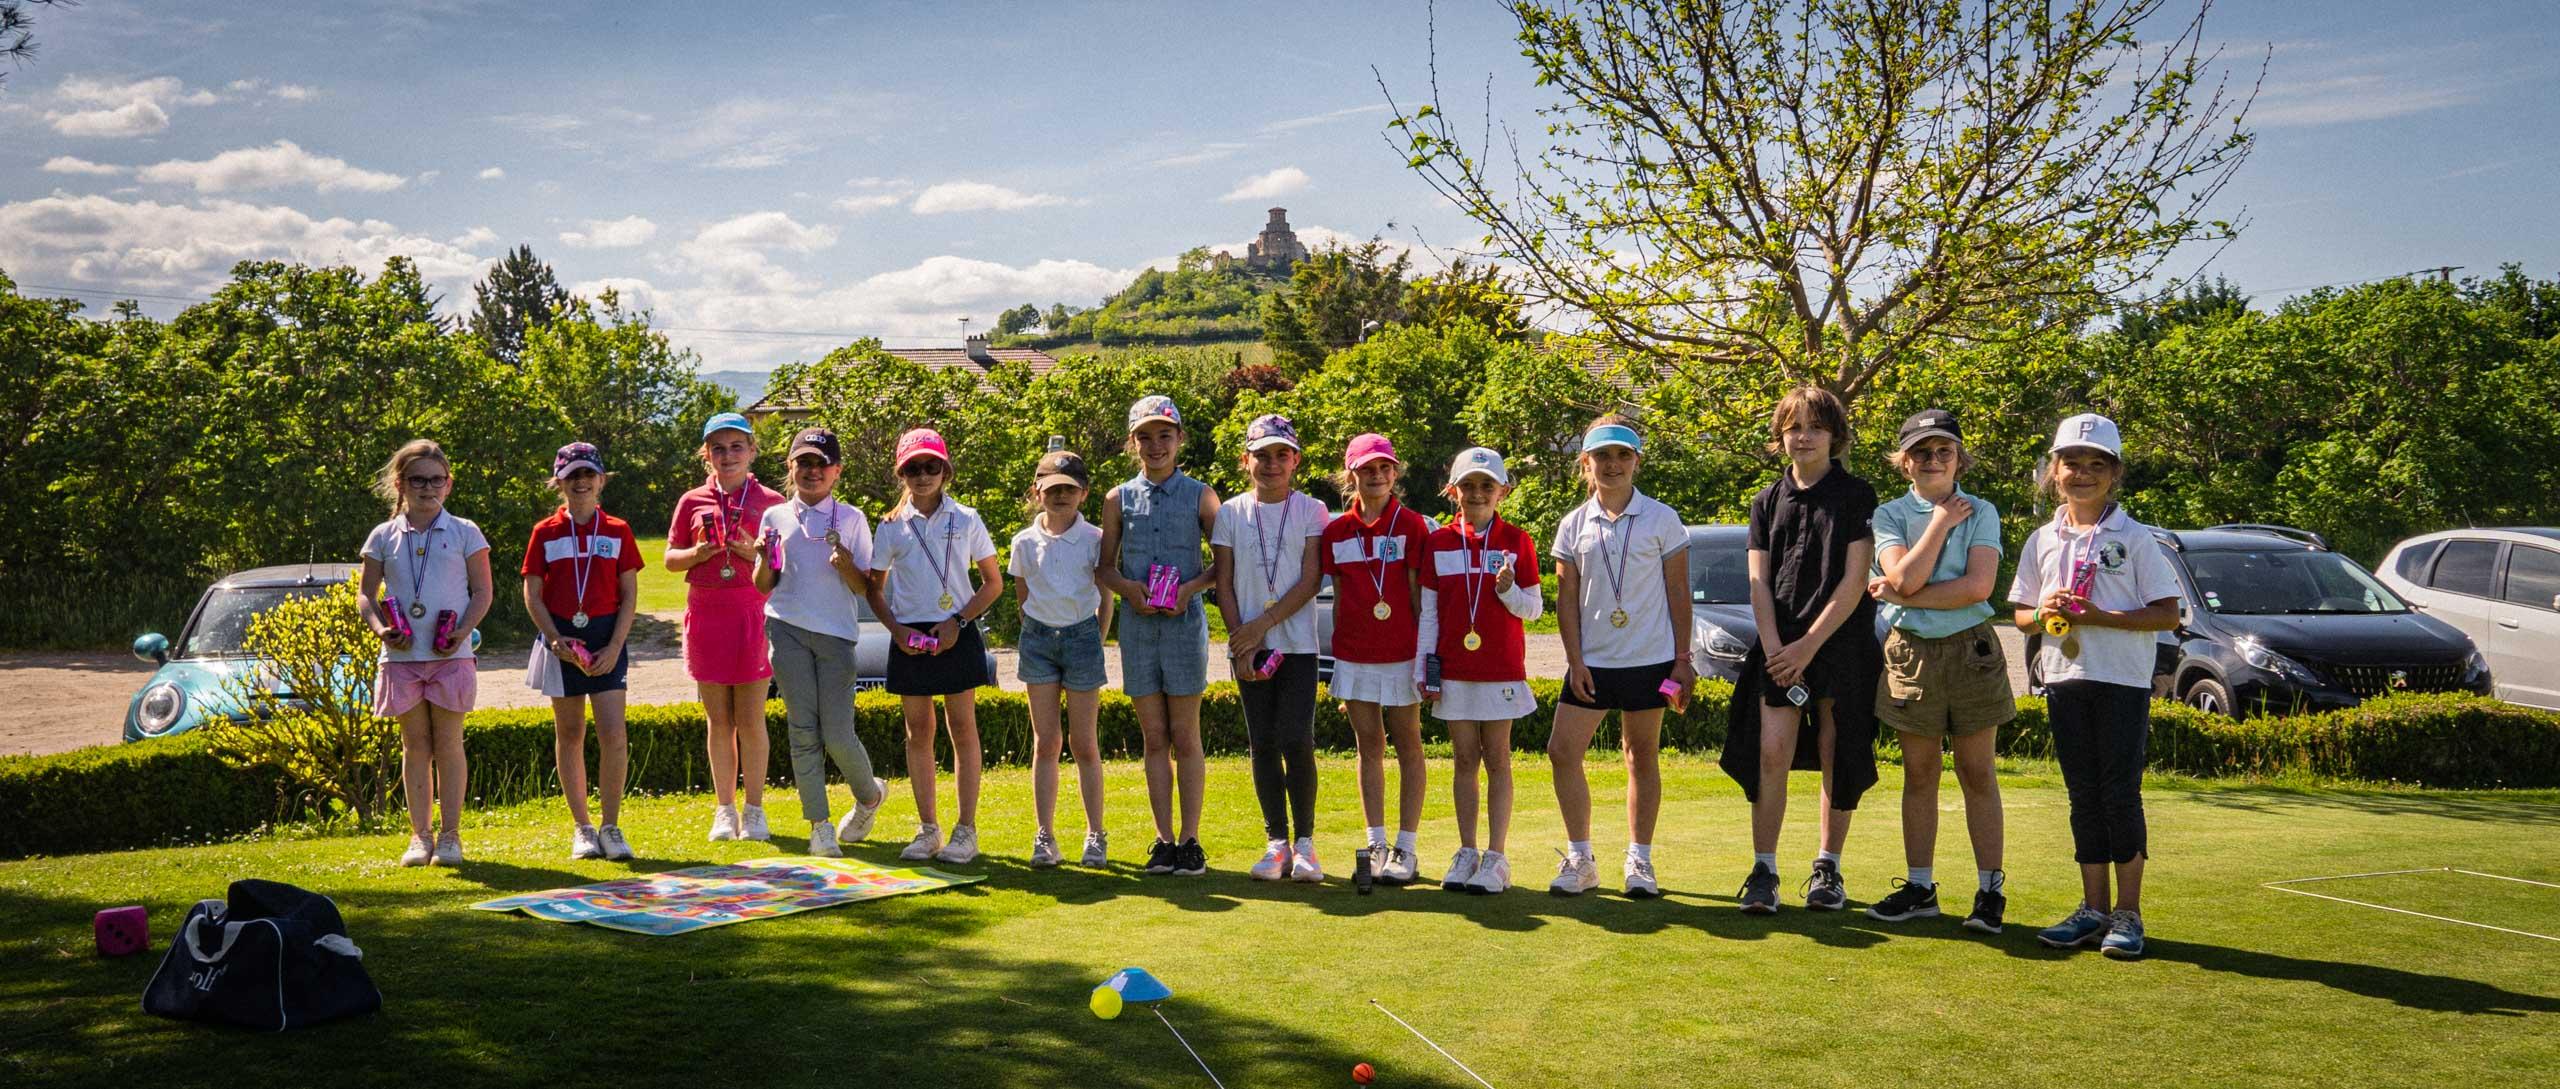 Copines Au Golf 2021 Superflu 65